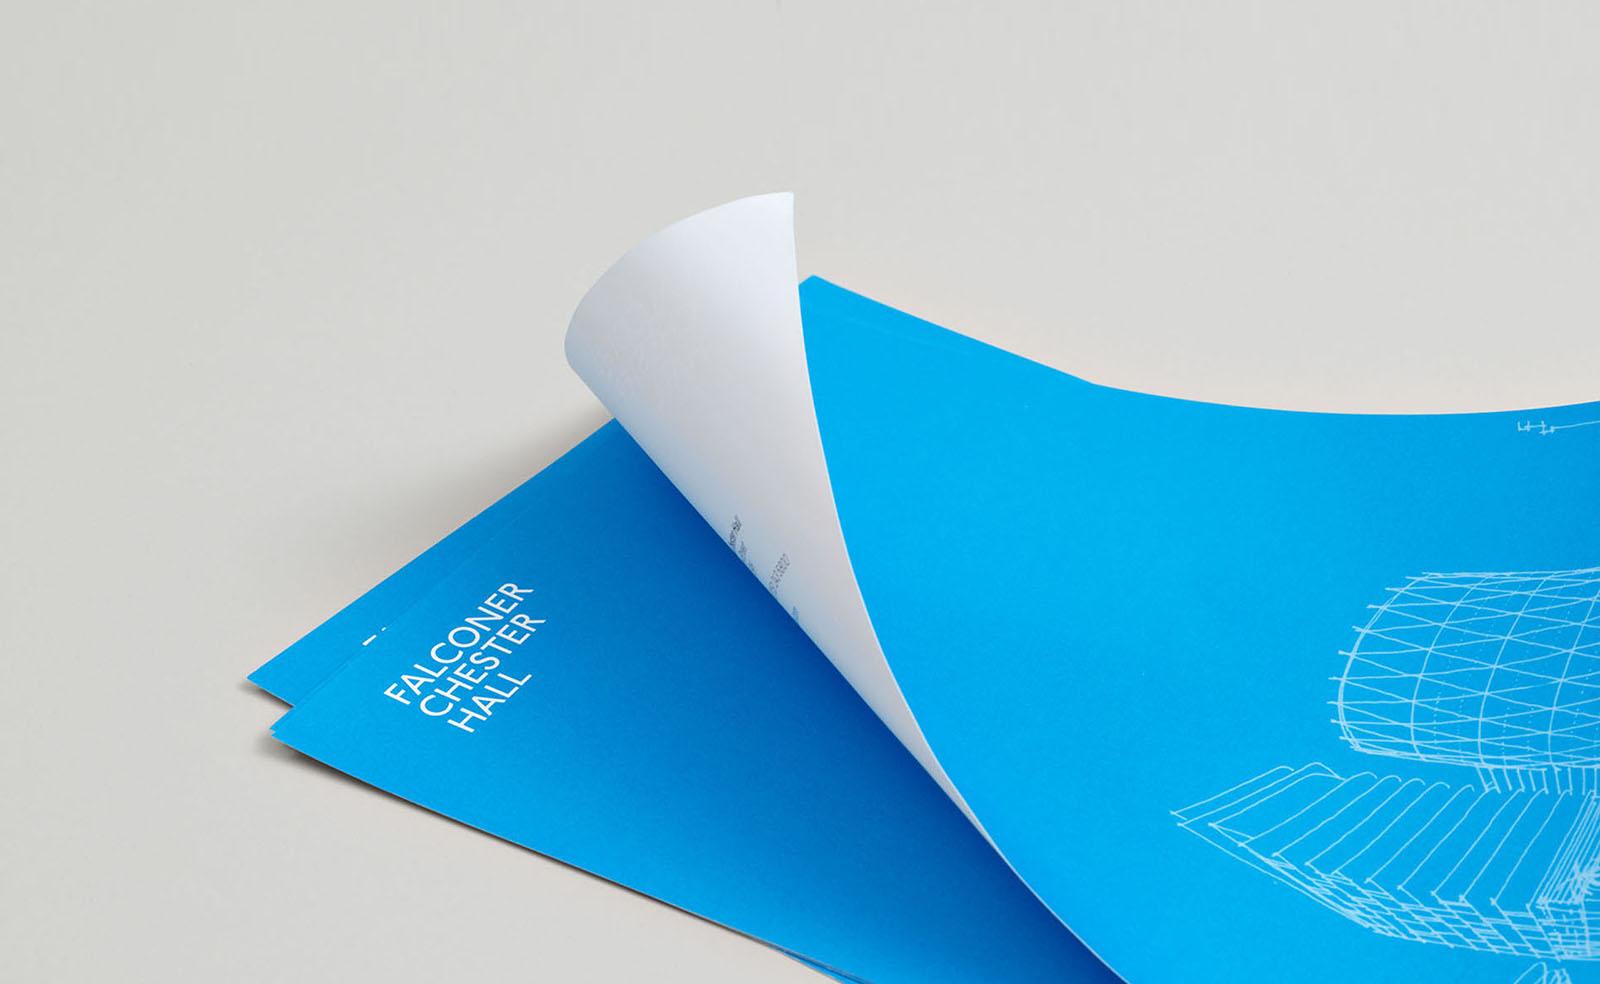 falconer-chester-hall-letterhead